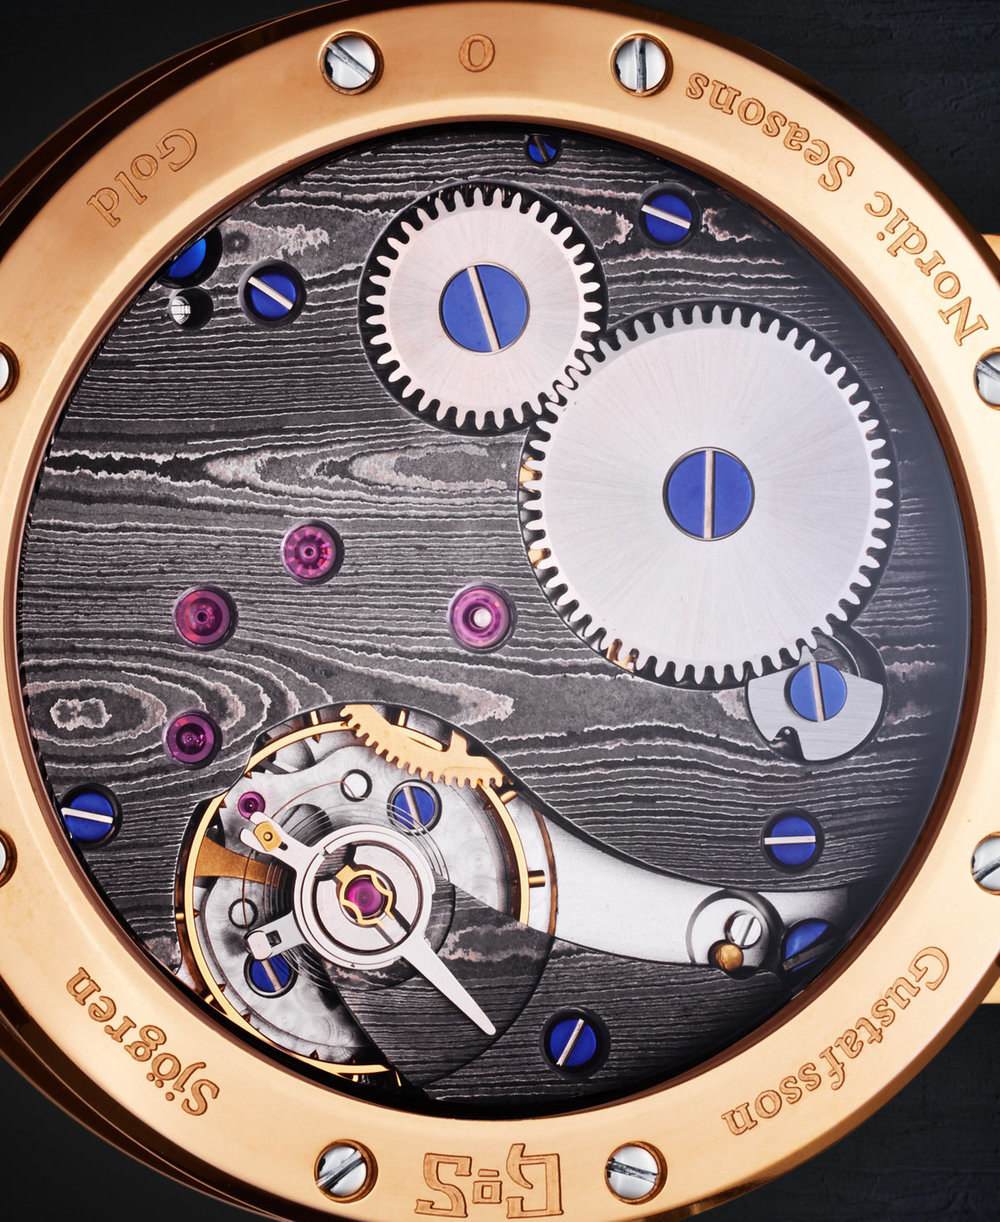 gos_winter_nights_gold_prototype_movement-close_up.jpg